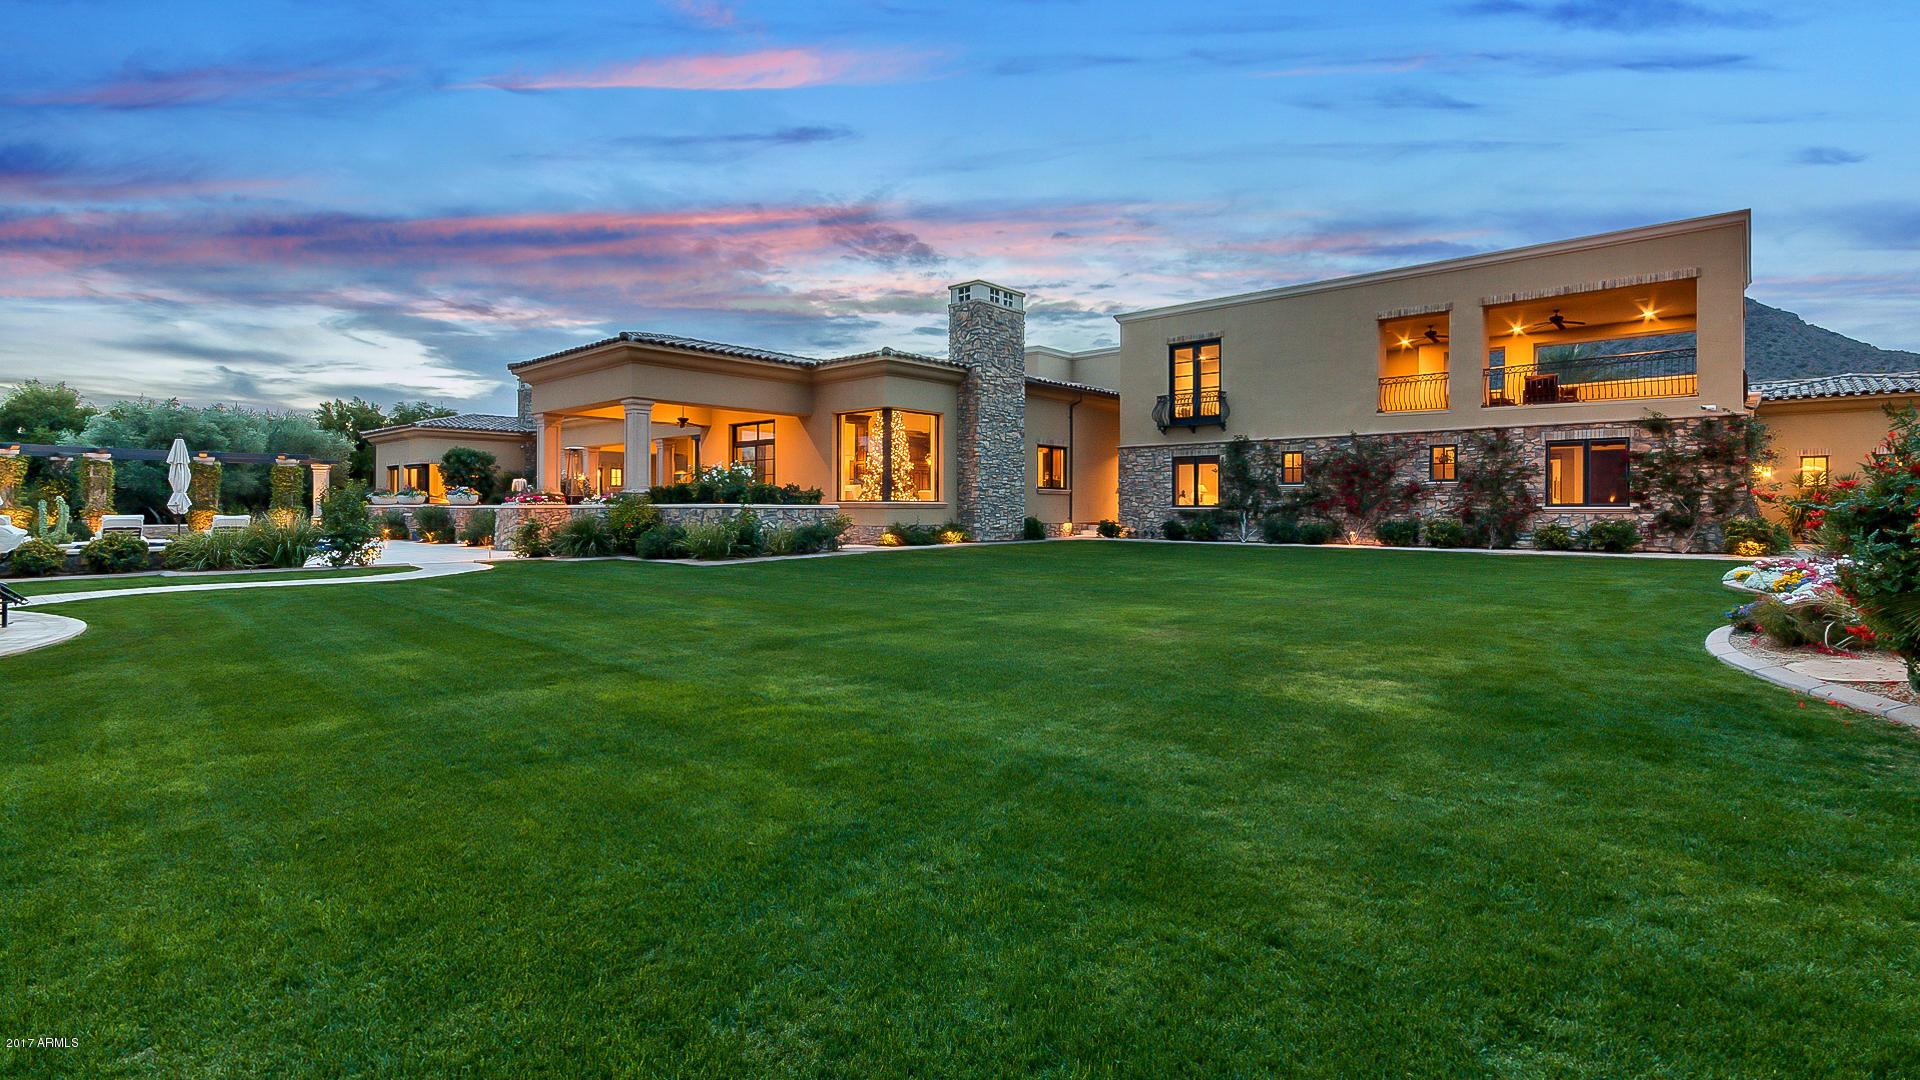 MLS 5872314 5335 N WILKINSON Road Unit 2, Paradise Valley, AZ 85253 Paradise Valley AZ Private Spa